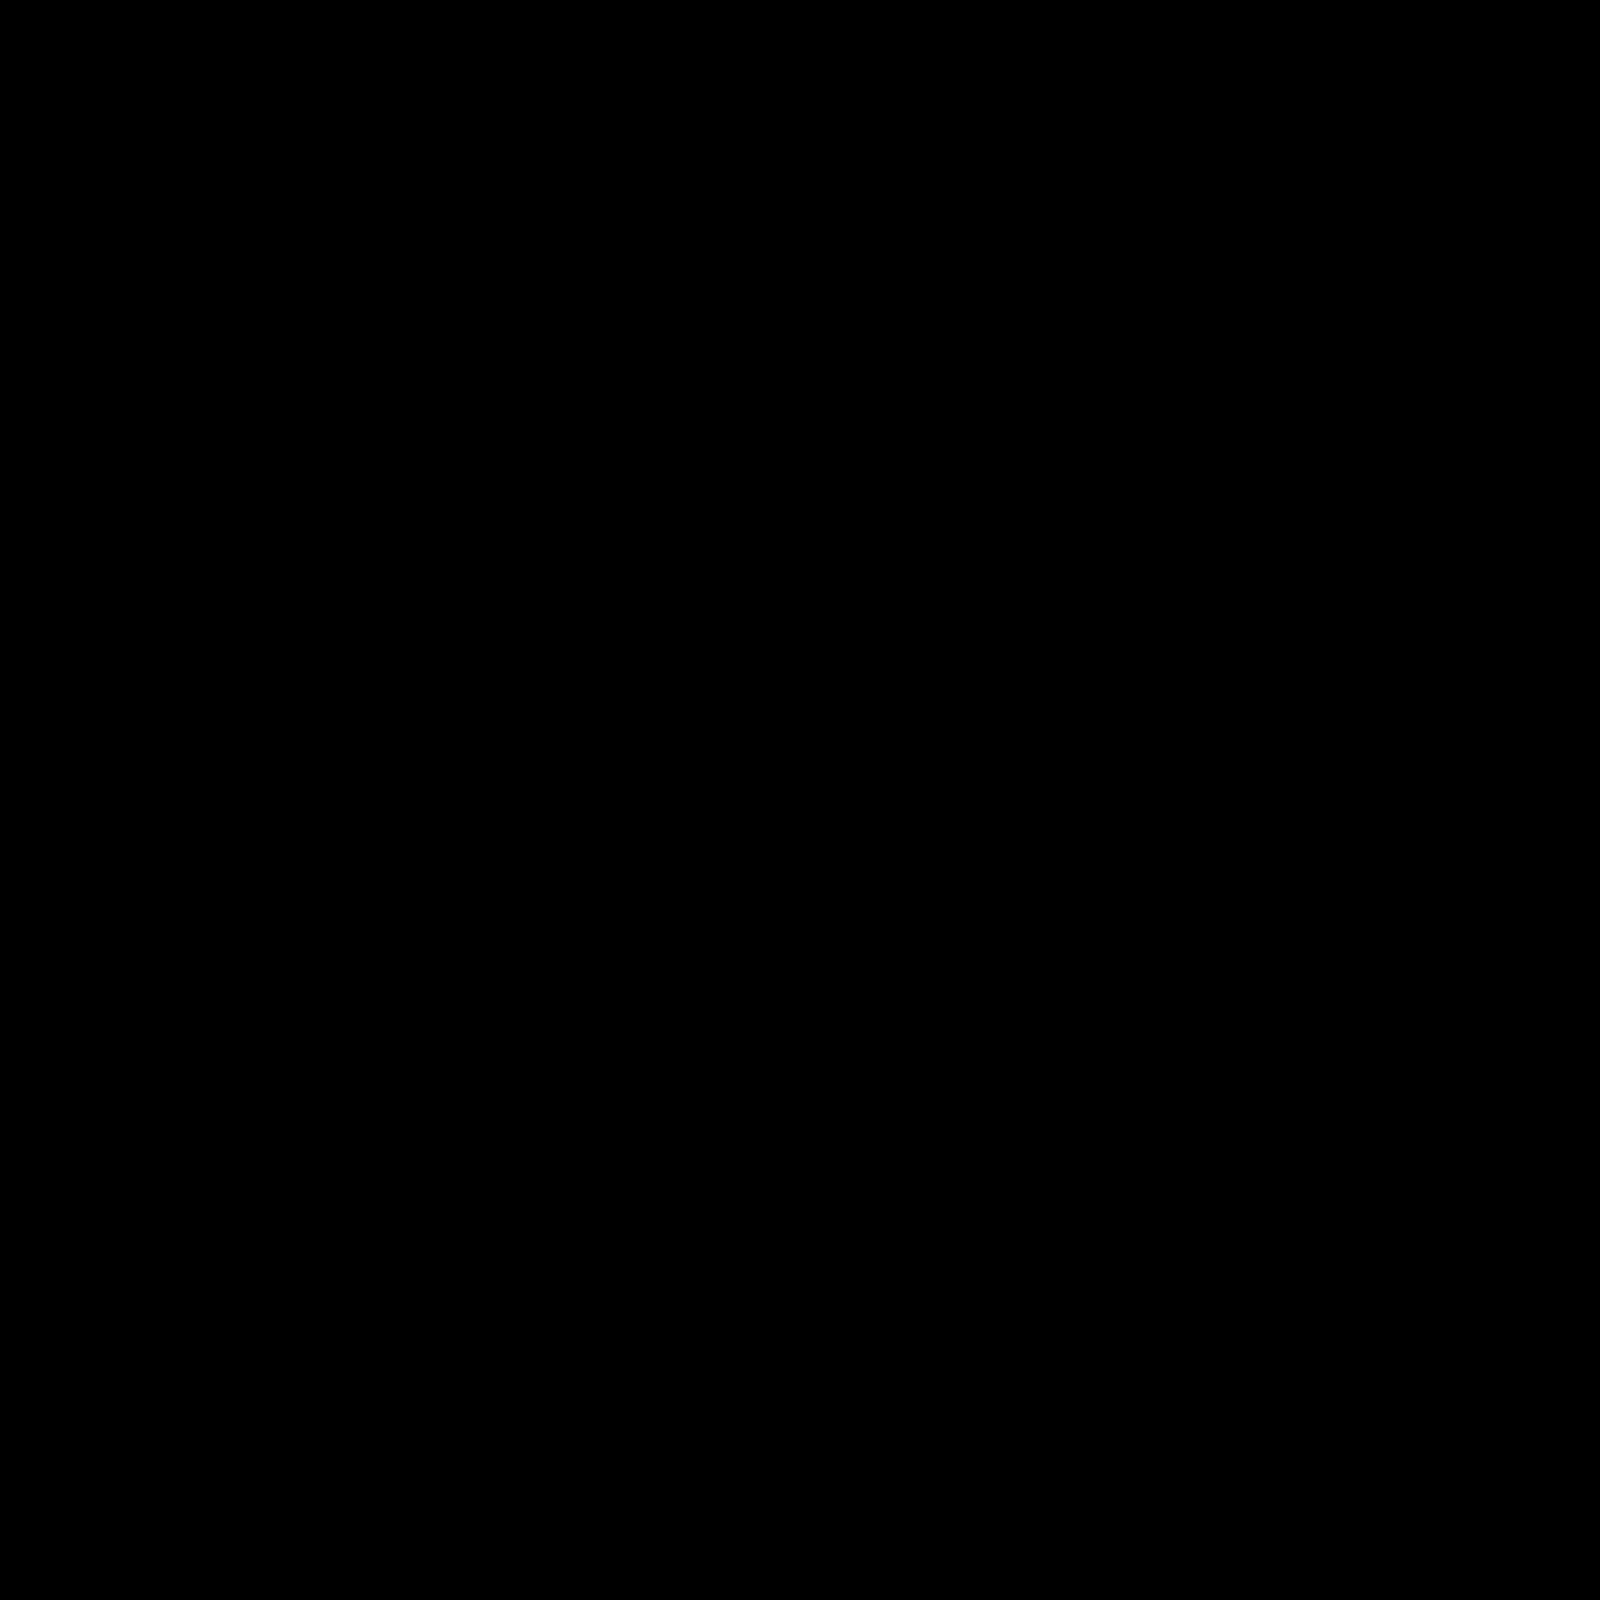 着信音量 icon